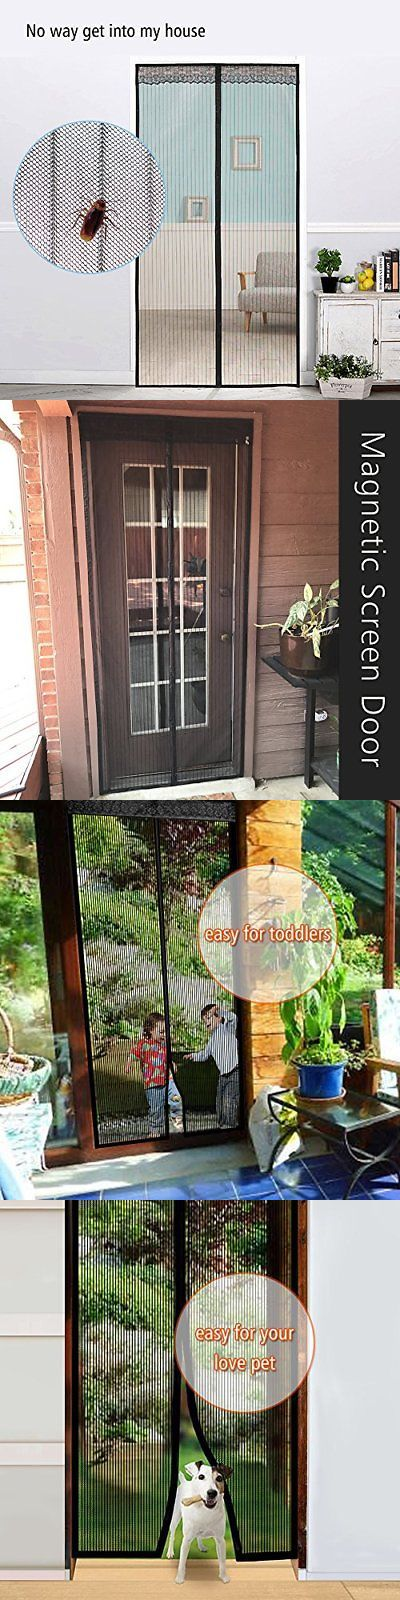 Screen Doors 180968: 35X82 Magnetic Mesh Screen Door Bugs Mosquito Fly Block Air Flow Velcro Frame -> BUY IT NOW ONLY: $35.43 on eBay!